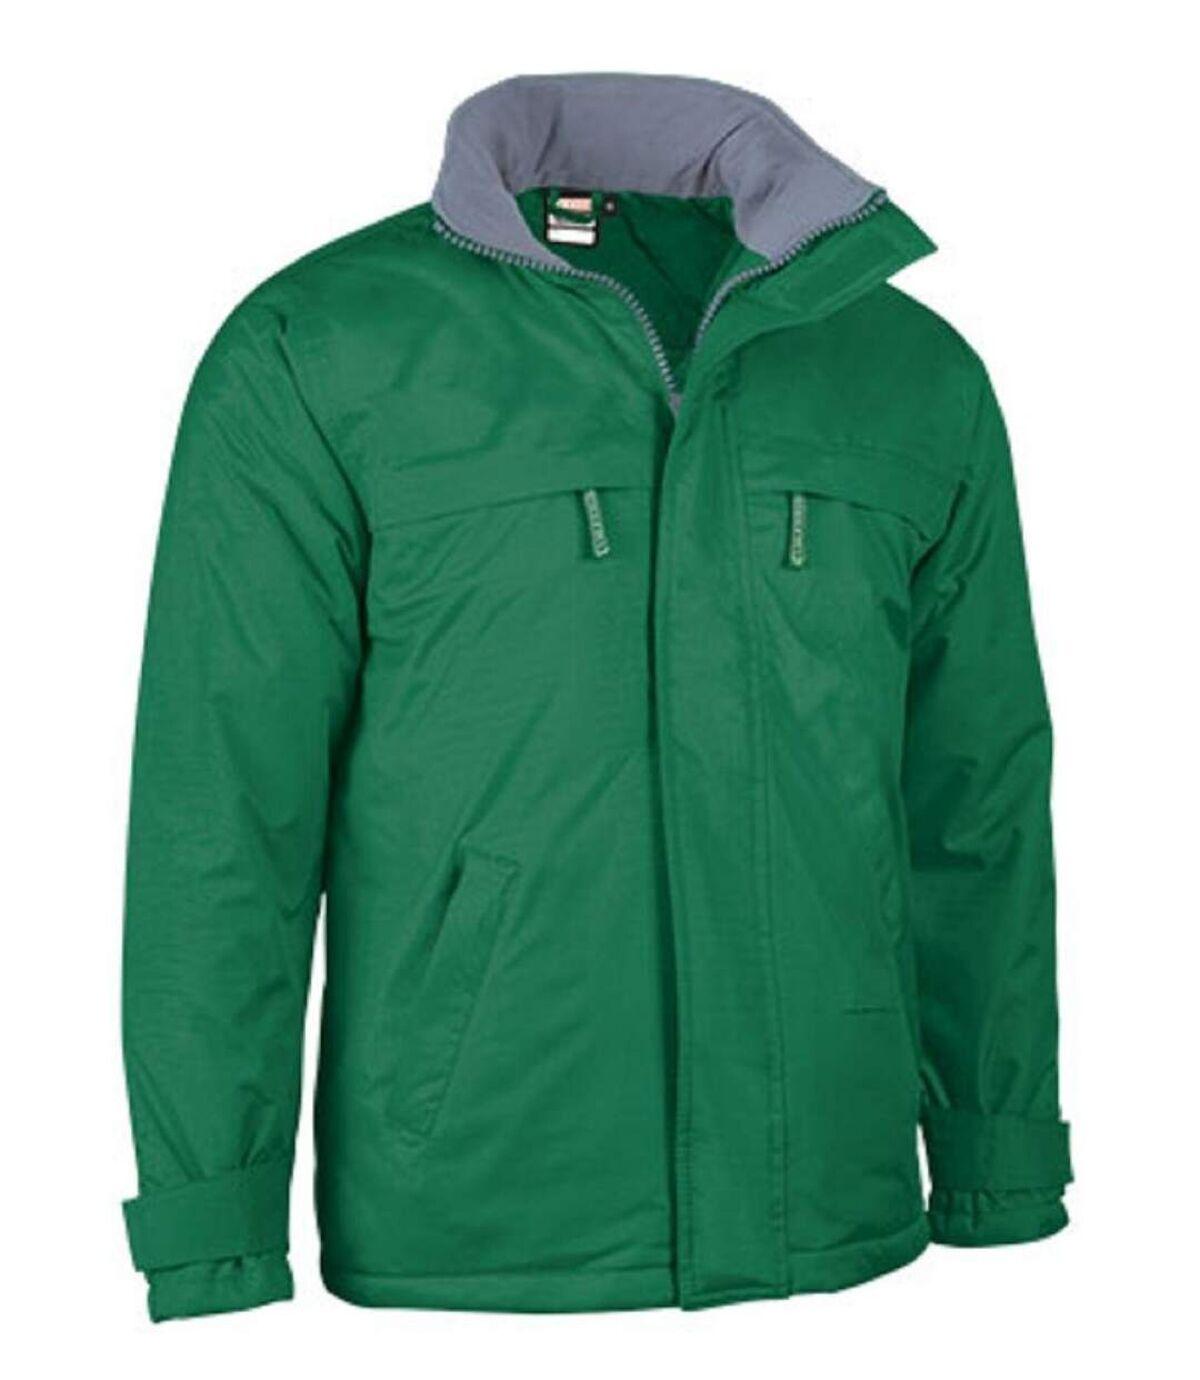 Parka - Homme - REF BOREAL - vert kelly